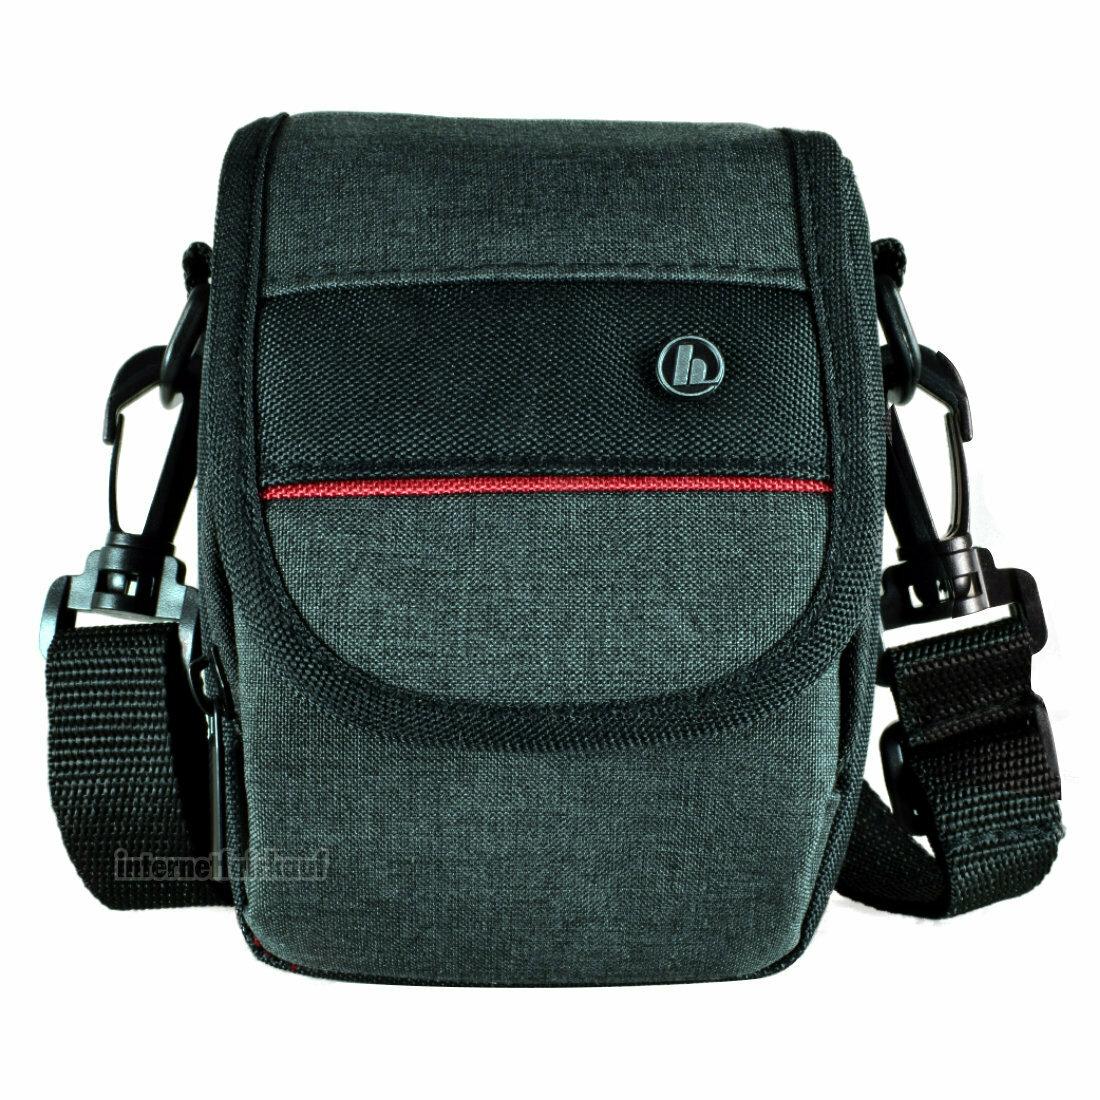 Hama Fototasche passend für Fuji X10 X20 X30 S2950 S2980